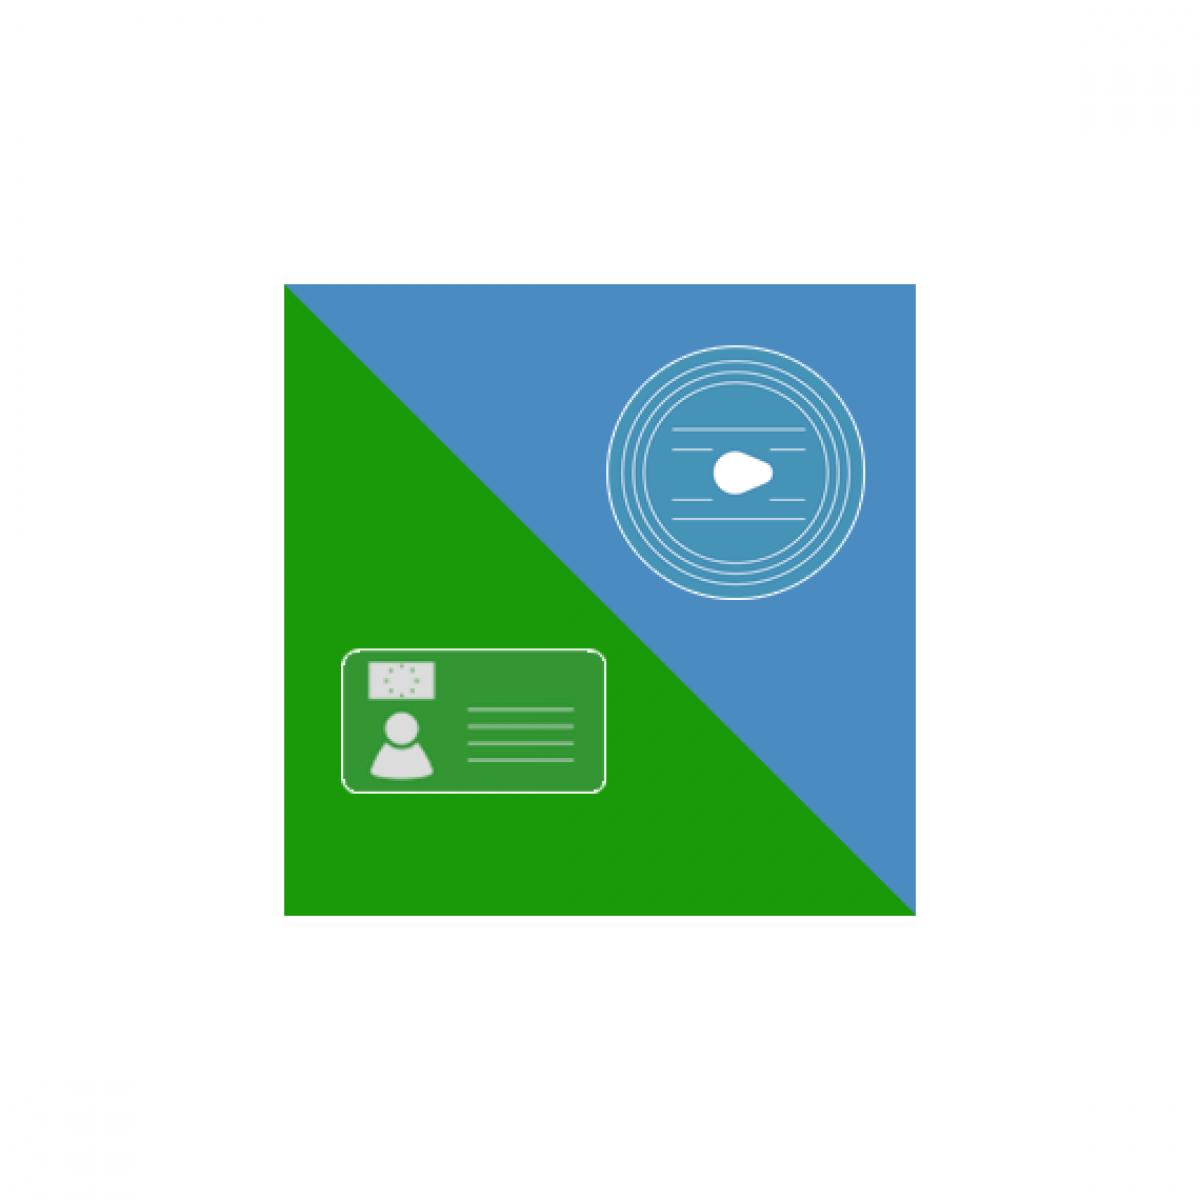 OPTAC3 Web: Paquete de Descarga Mixta